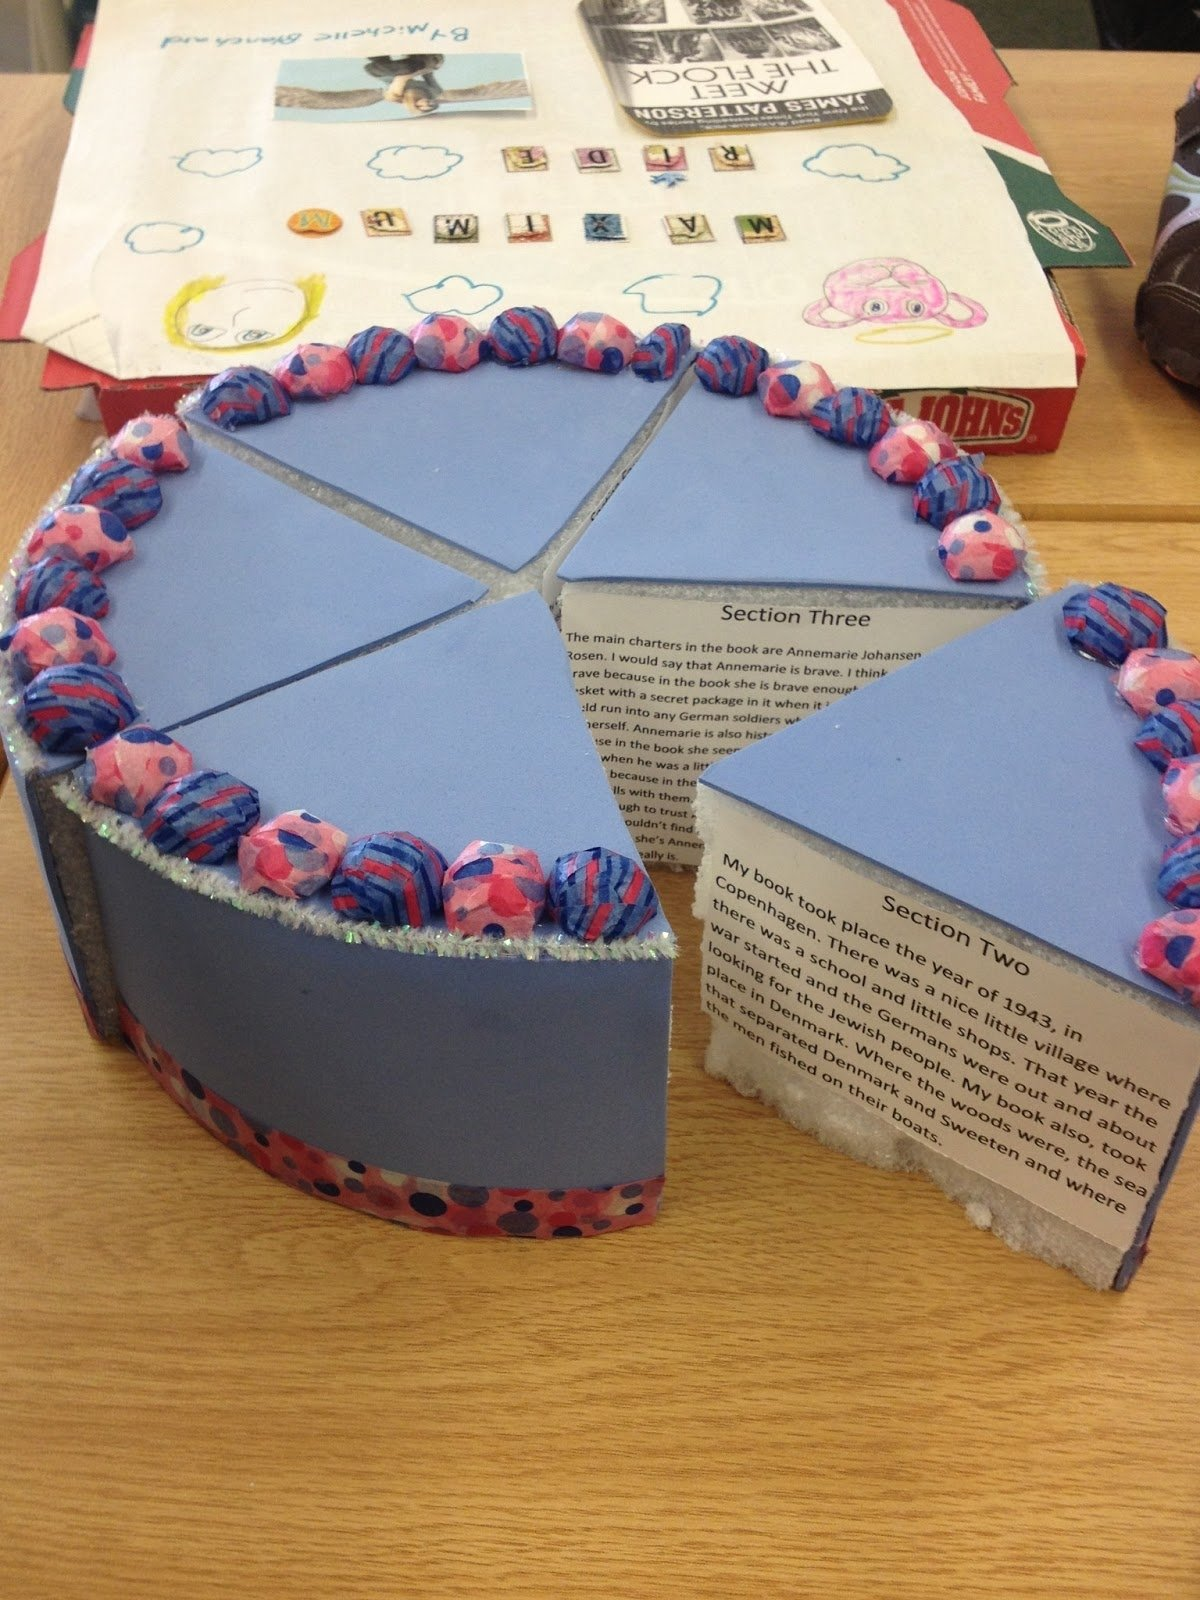 10 Beautiful Creative Project Ideas For School a tasty reading project mrs beatties classroom 1 2020